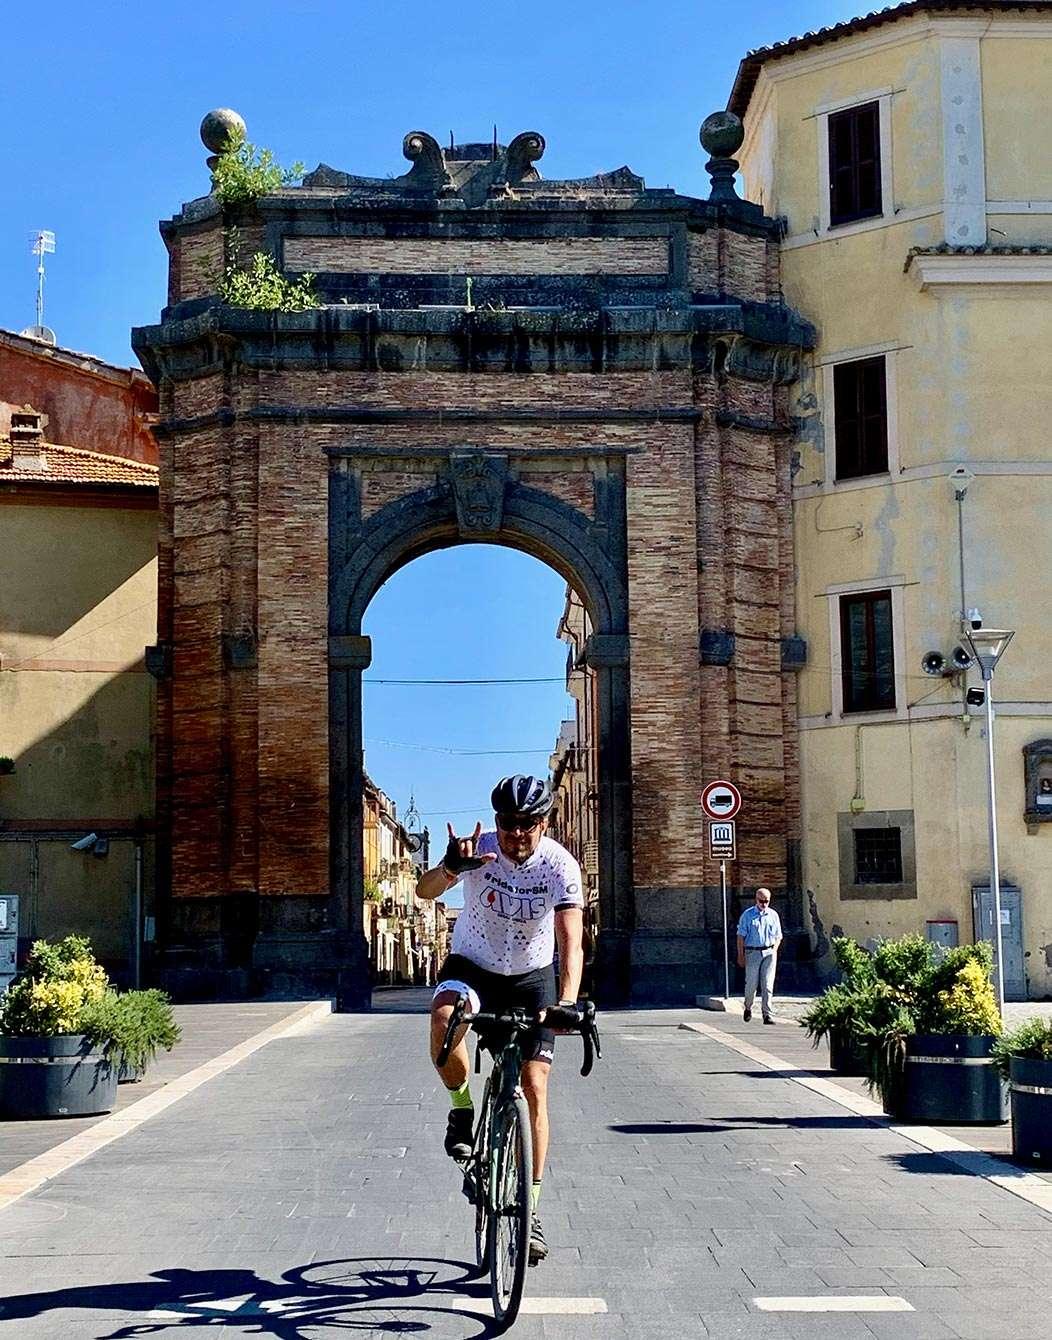 Gravel bike tour Siena to Rome Campagnano